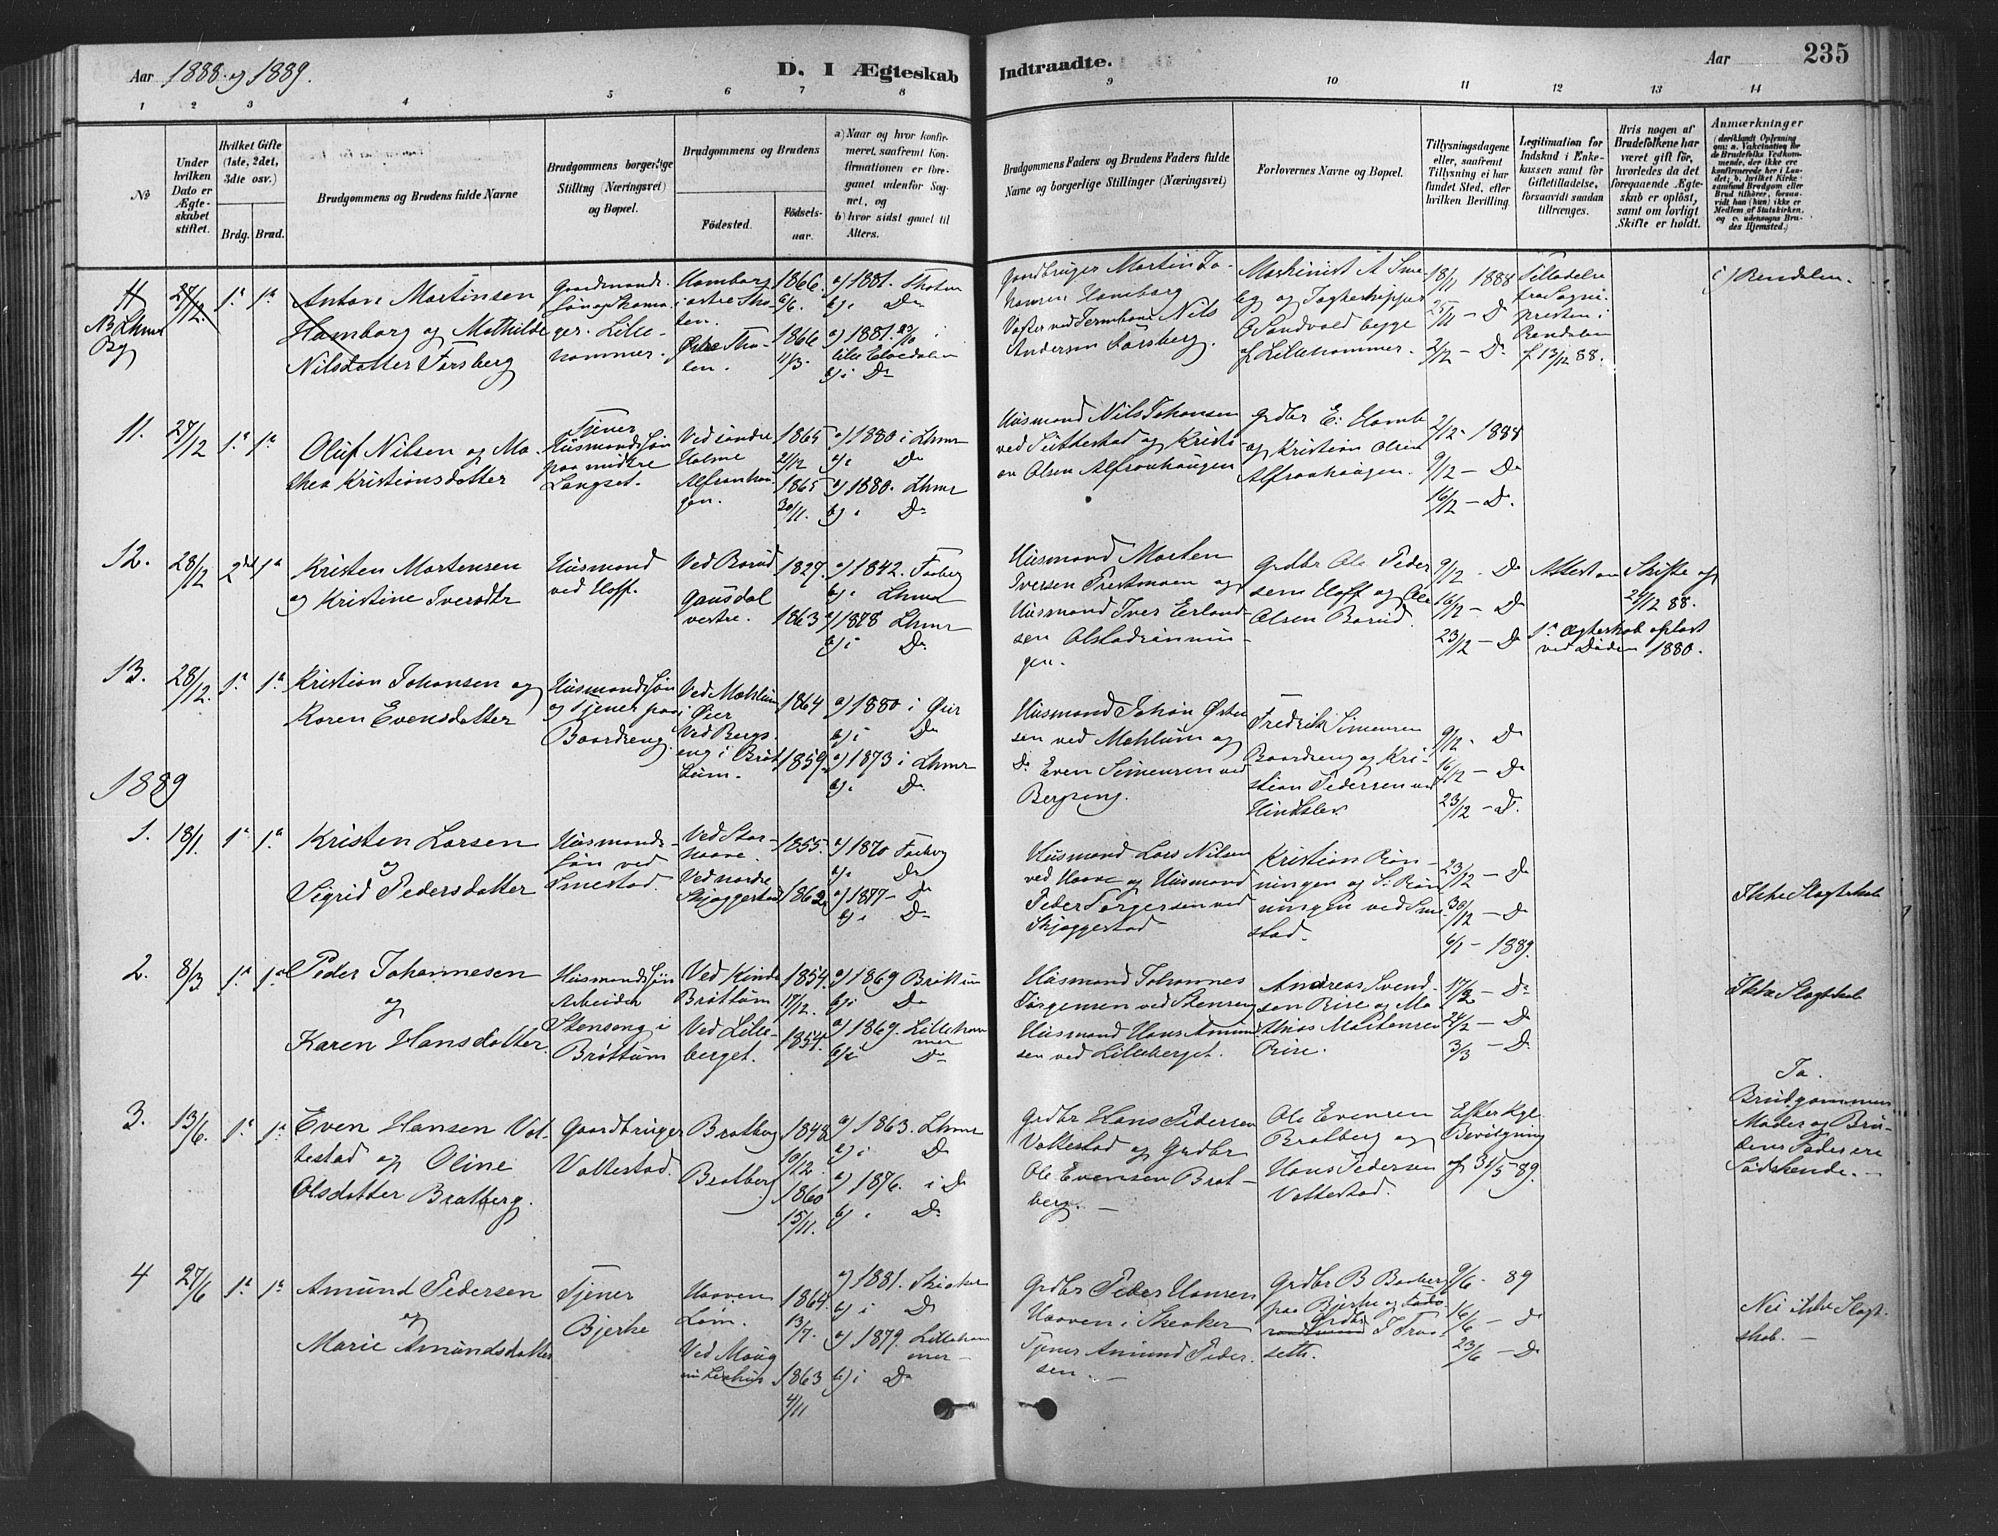 SAH, Fåberg prestekontor, Ministerialbok nr. 9, 1879-1898, s. 235